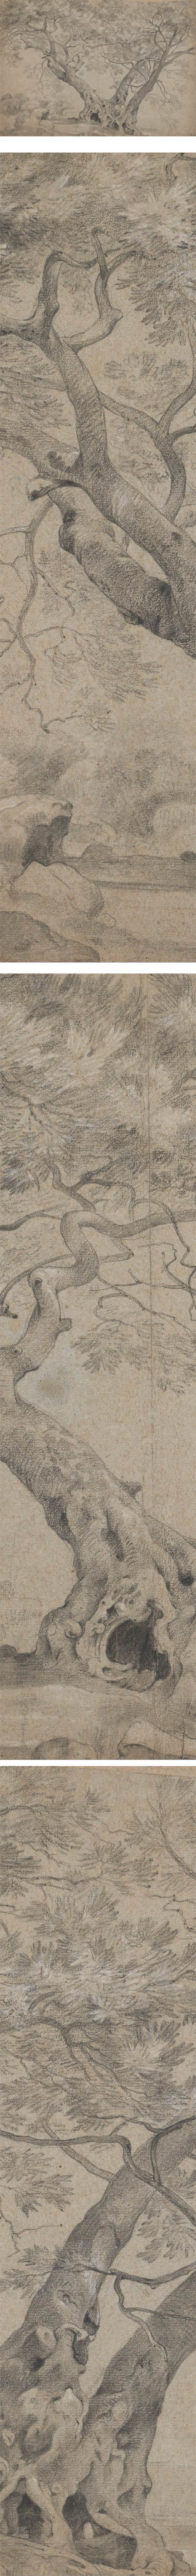 The Arbra Sacra on the Banks of Lake Nemi, Richard Wilson, black and white chalk drawing on laid paper